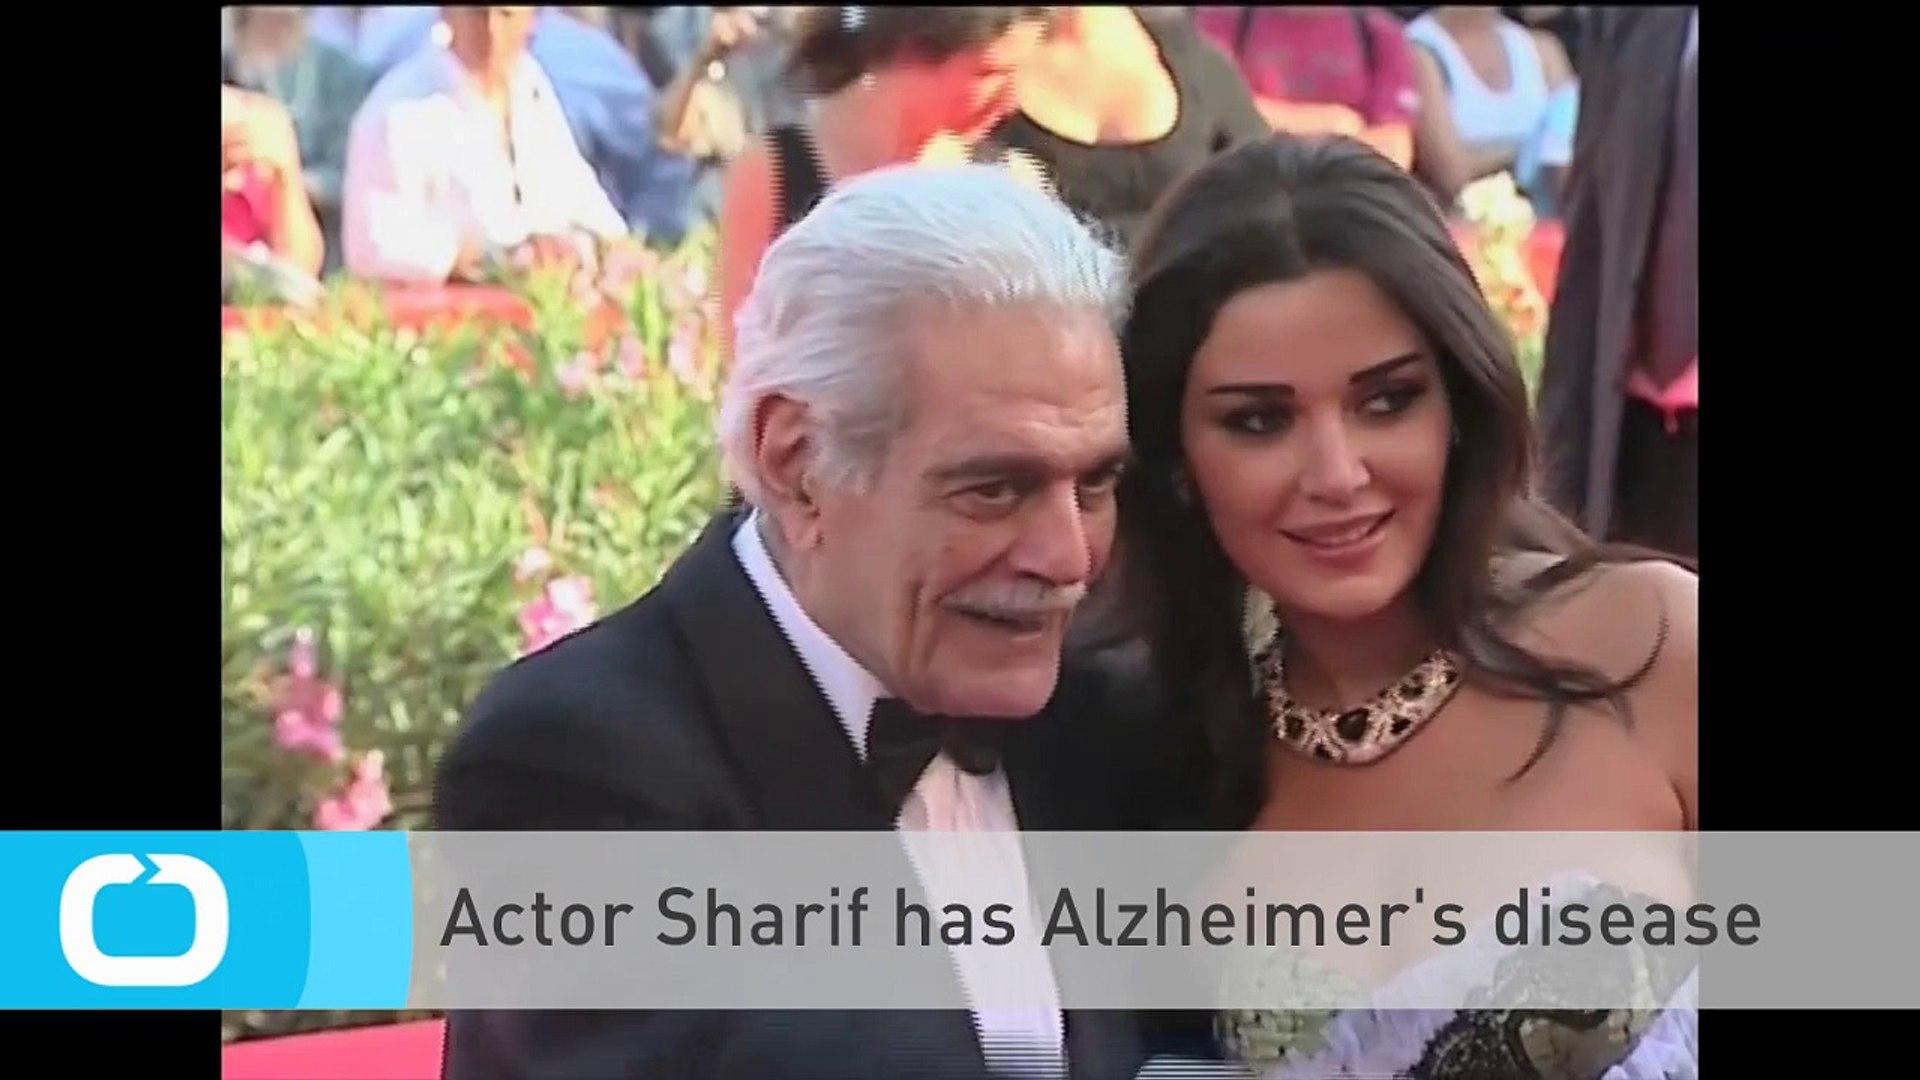 Actor Sharif Has Alzheimer's Disease